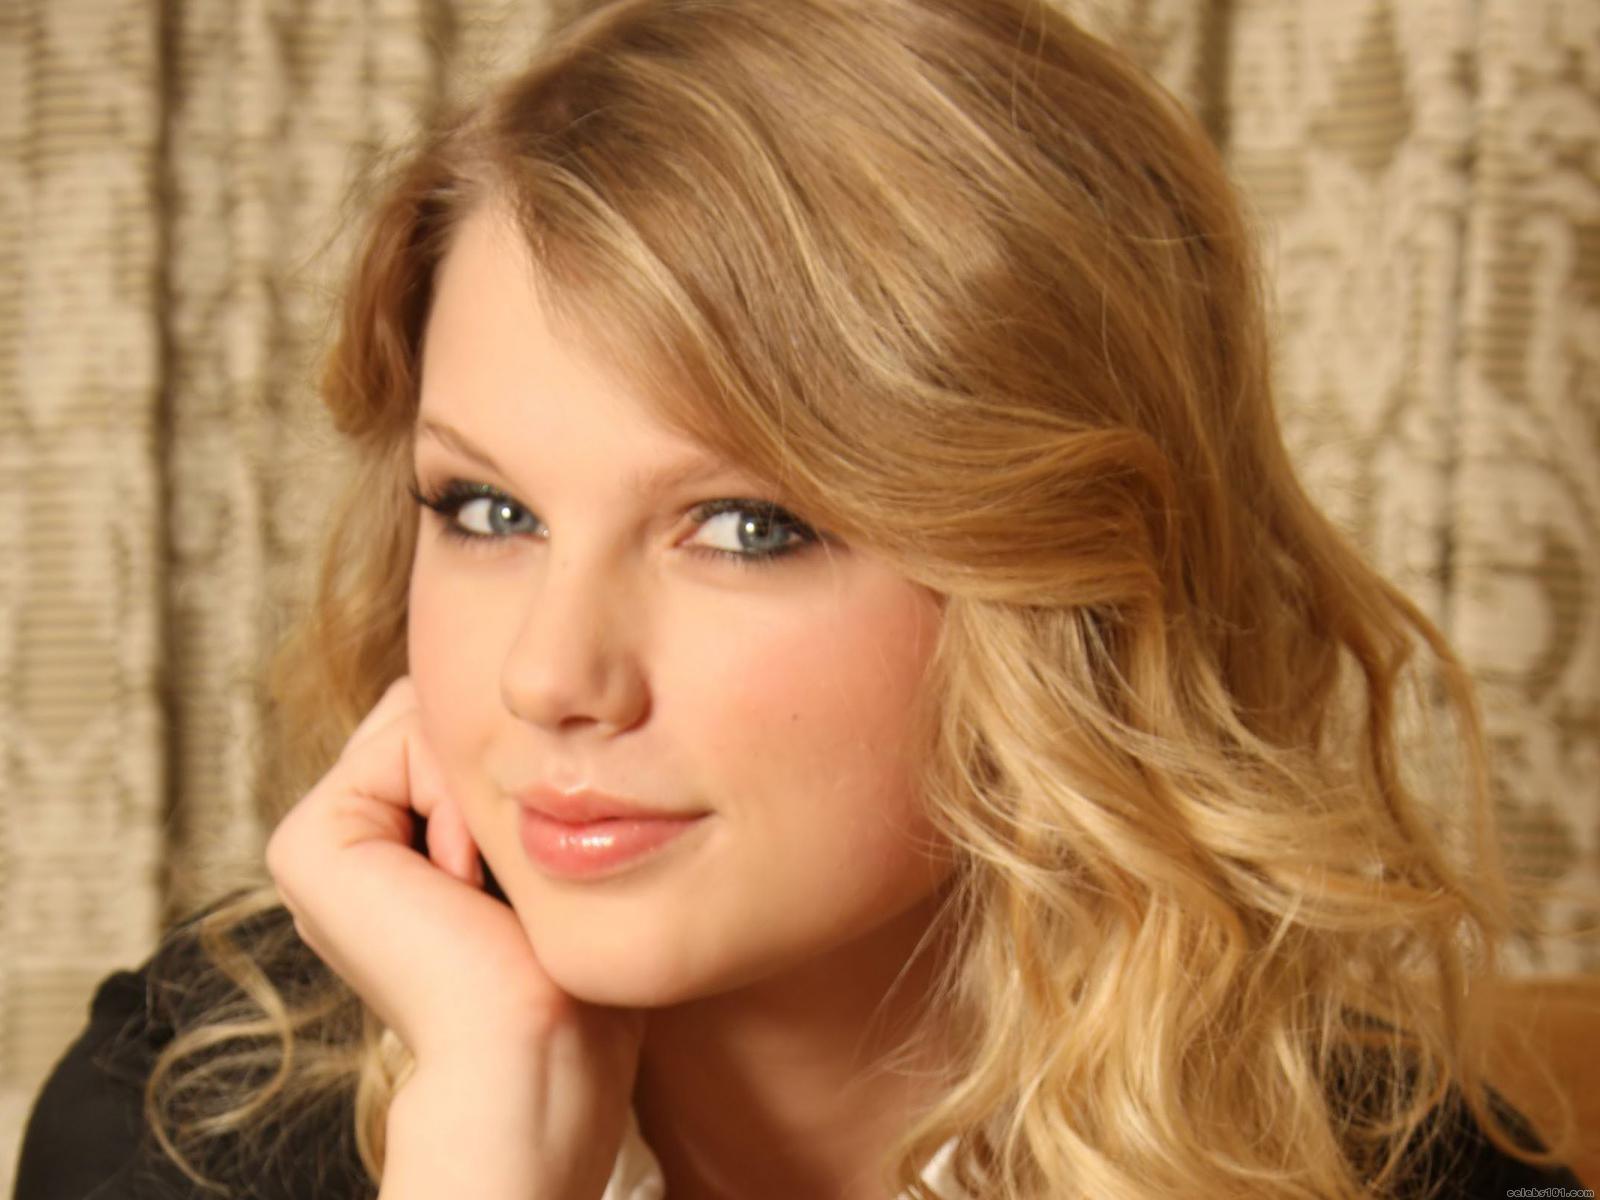 http://3.bp.blogspot.com/-cg2nysI3D70/TspULXXhDSI/AAAAAAAAAQA/nUf9G-tpxYA/s1600/Taylor_Swift_10.jpeg